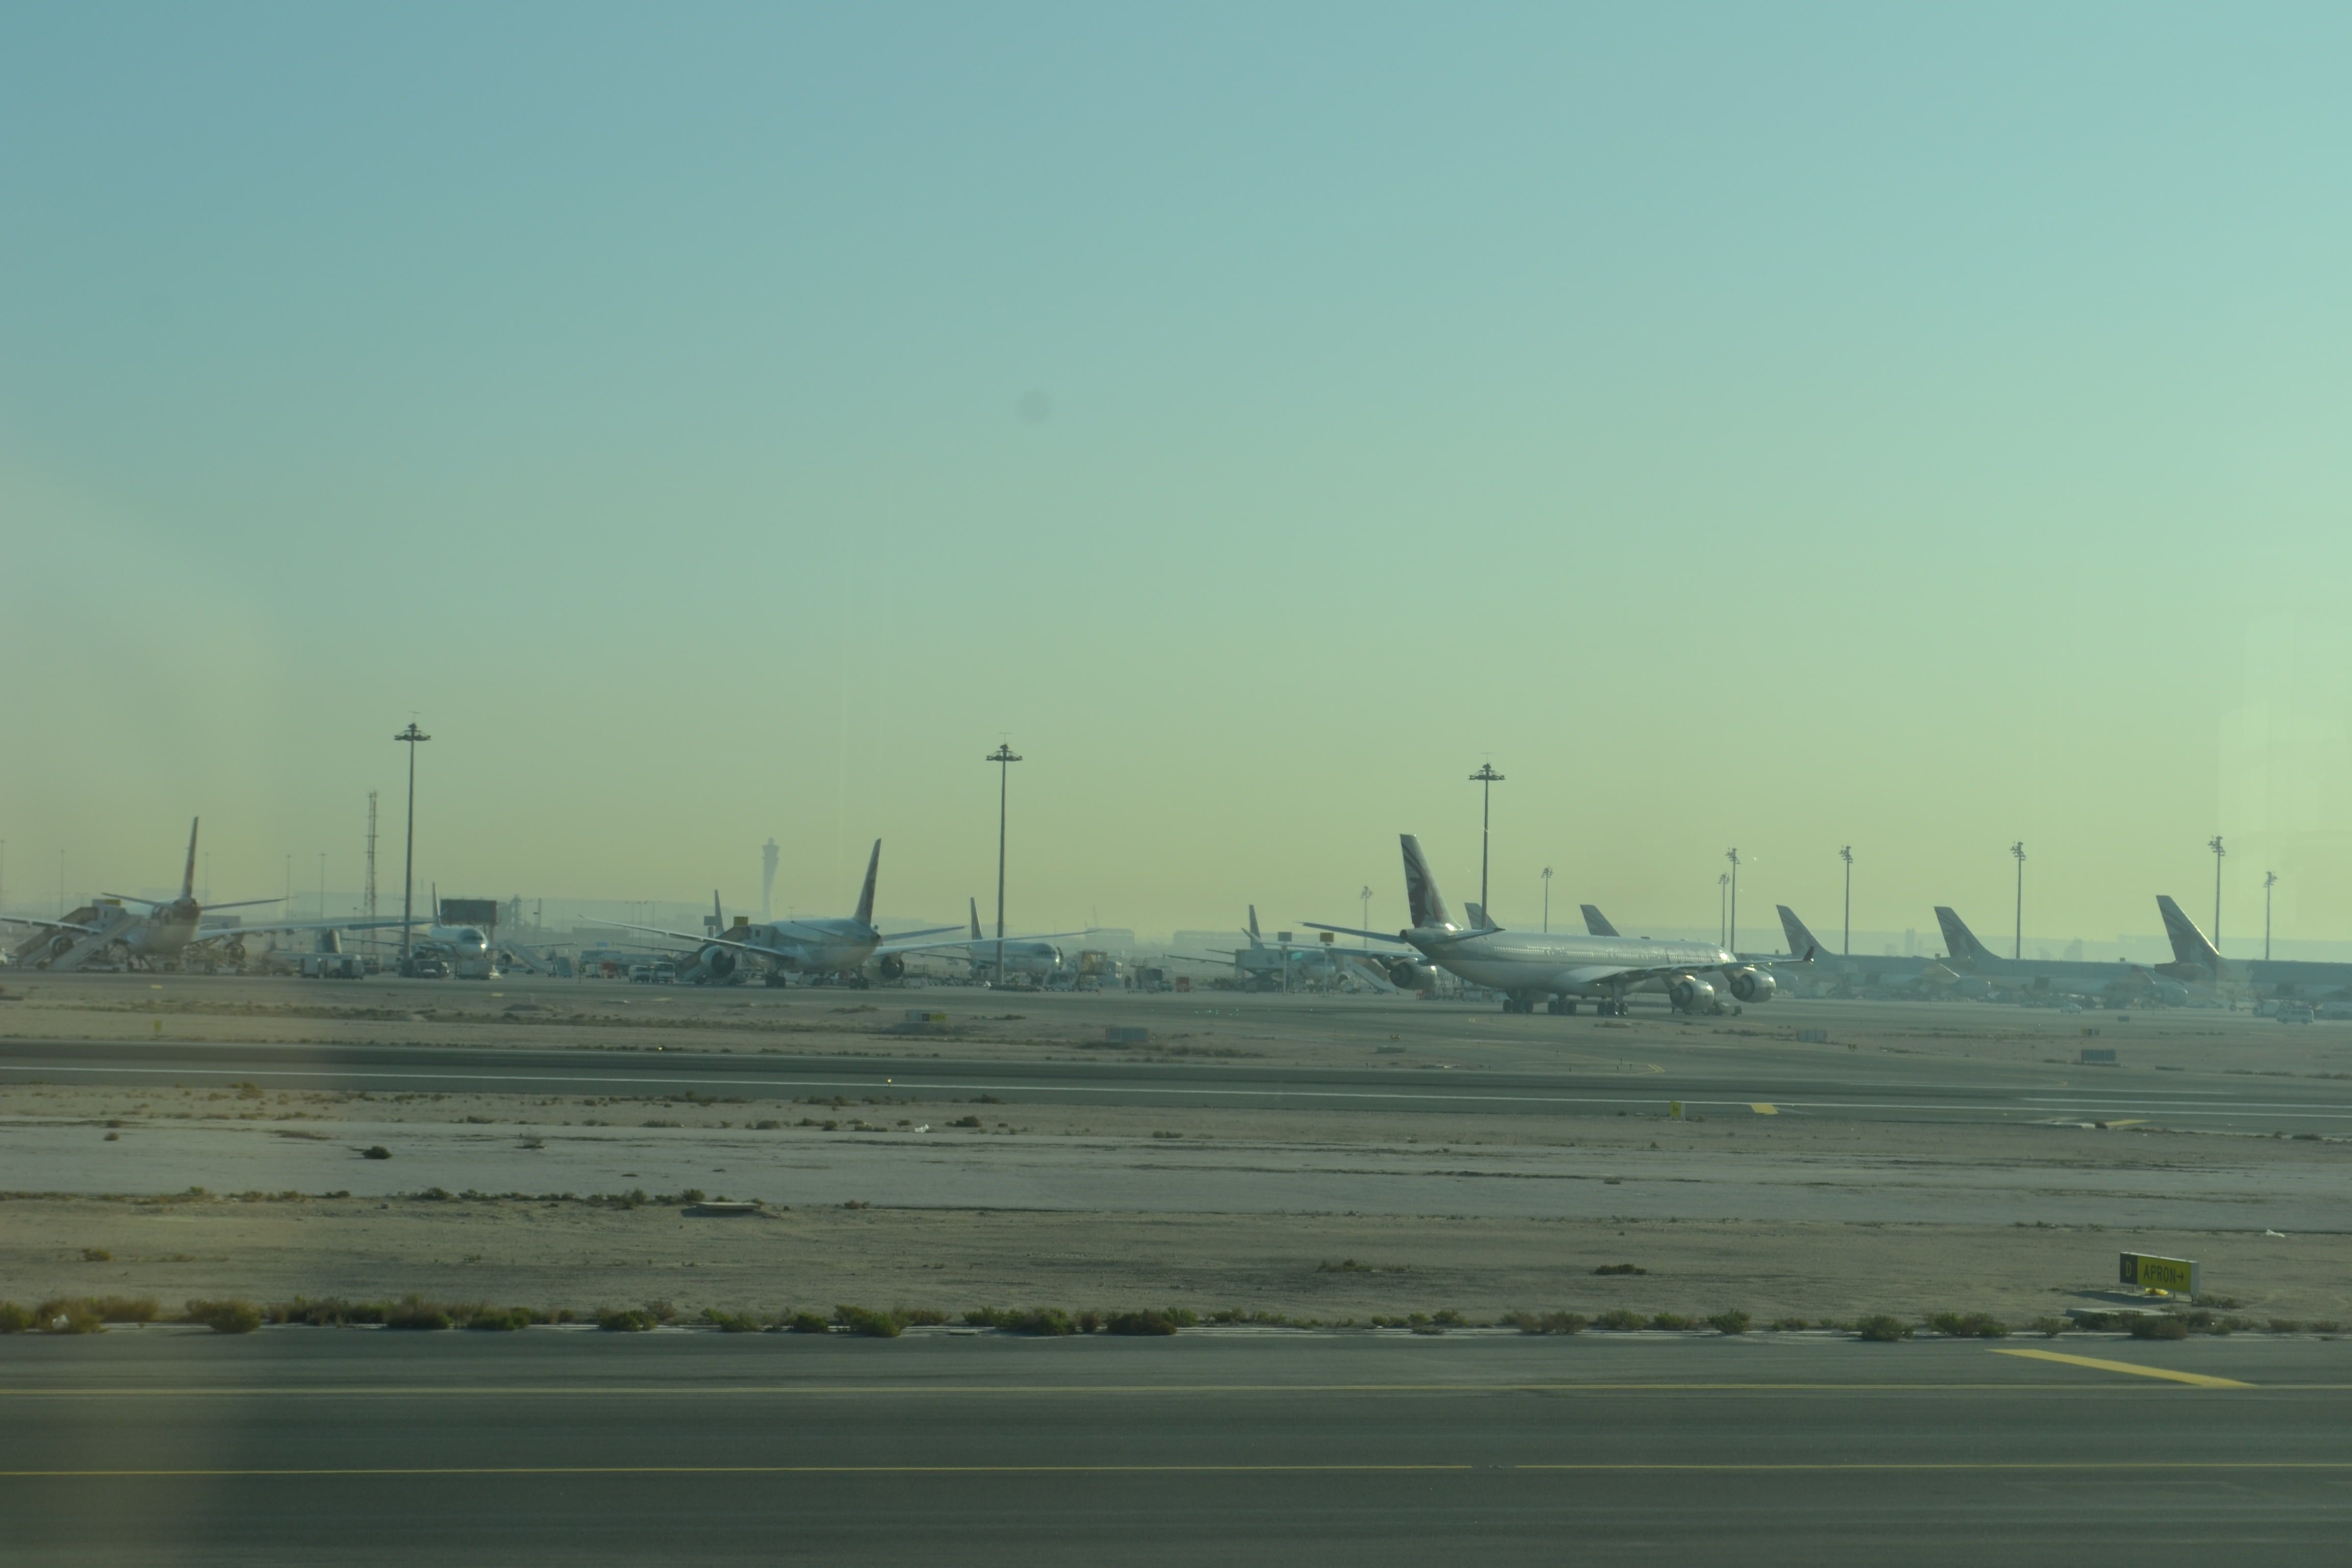 Aeroporto Del Qatar : Qatar aeroporto doha internazionale hamad doh